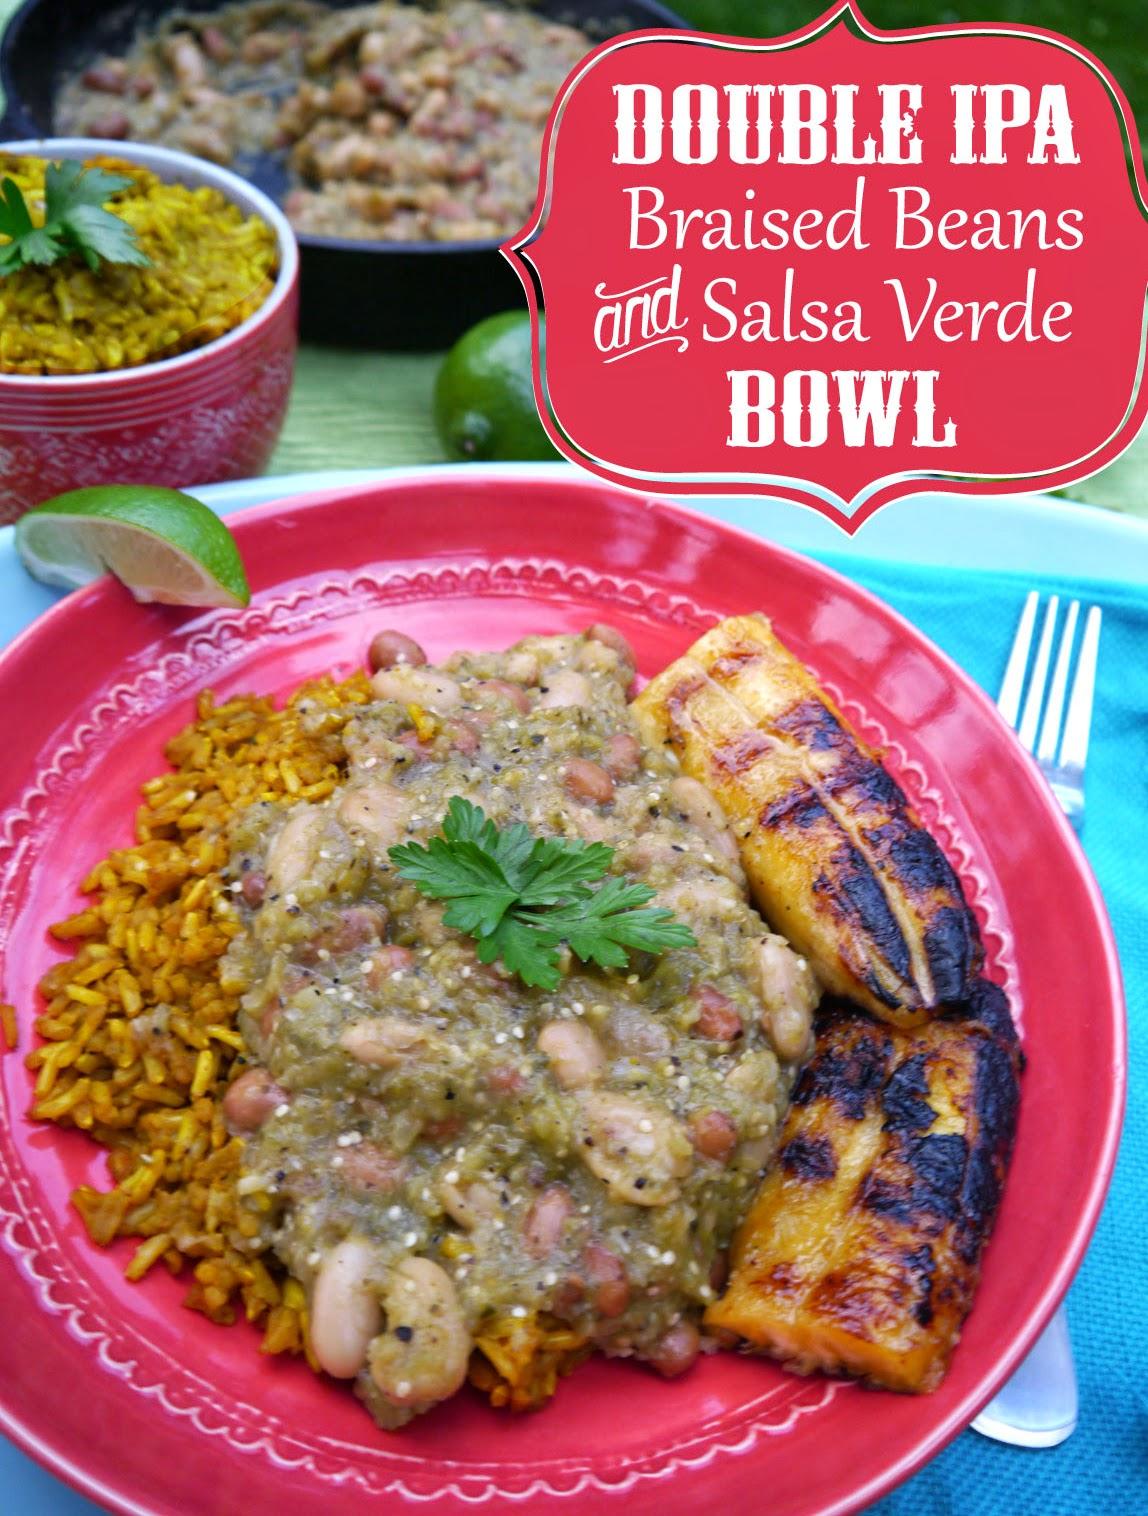 NY FoodGasm: A Vegan Foodgasm: Double IPA Braised Bean and ...